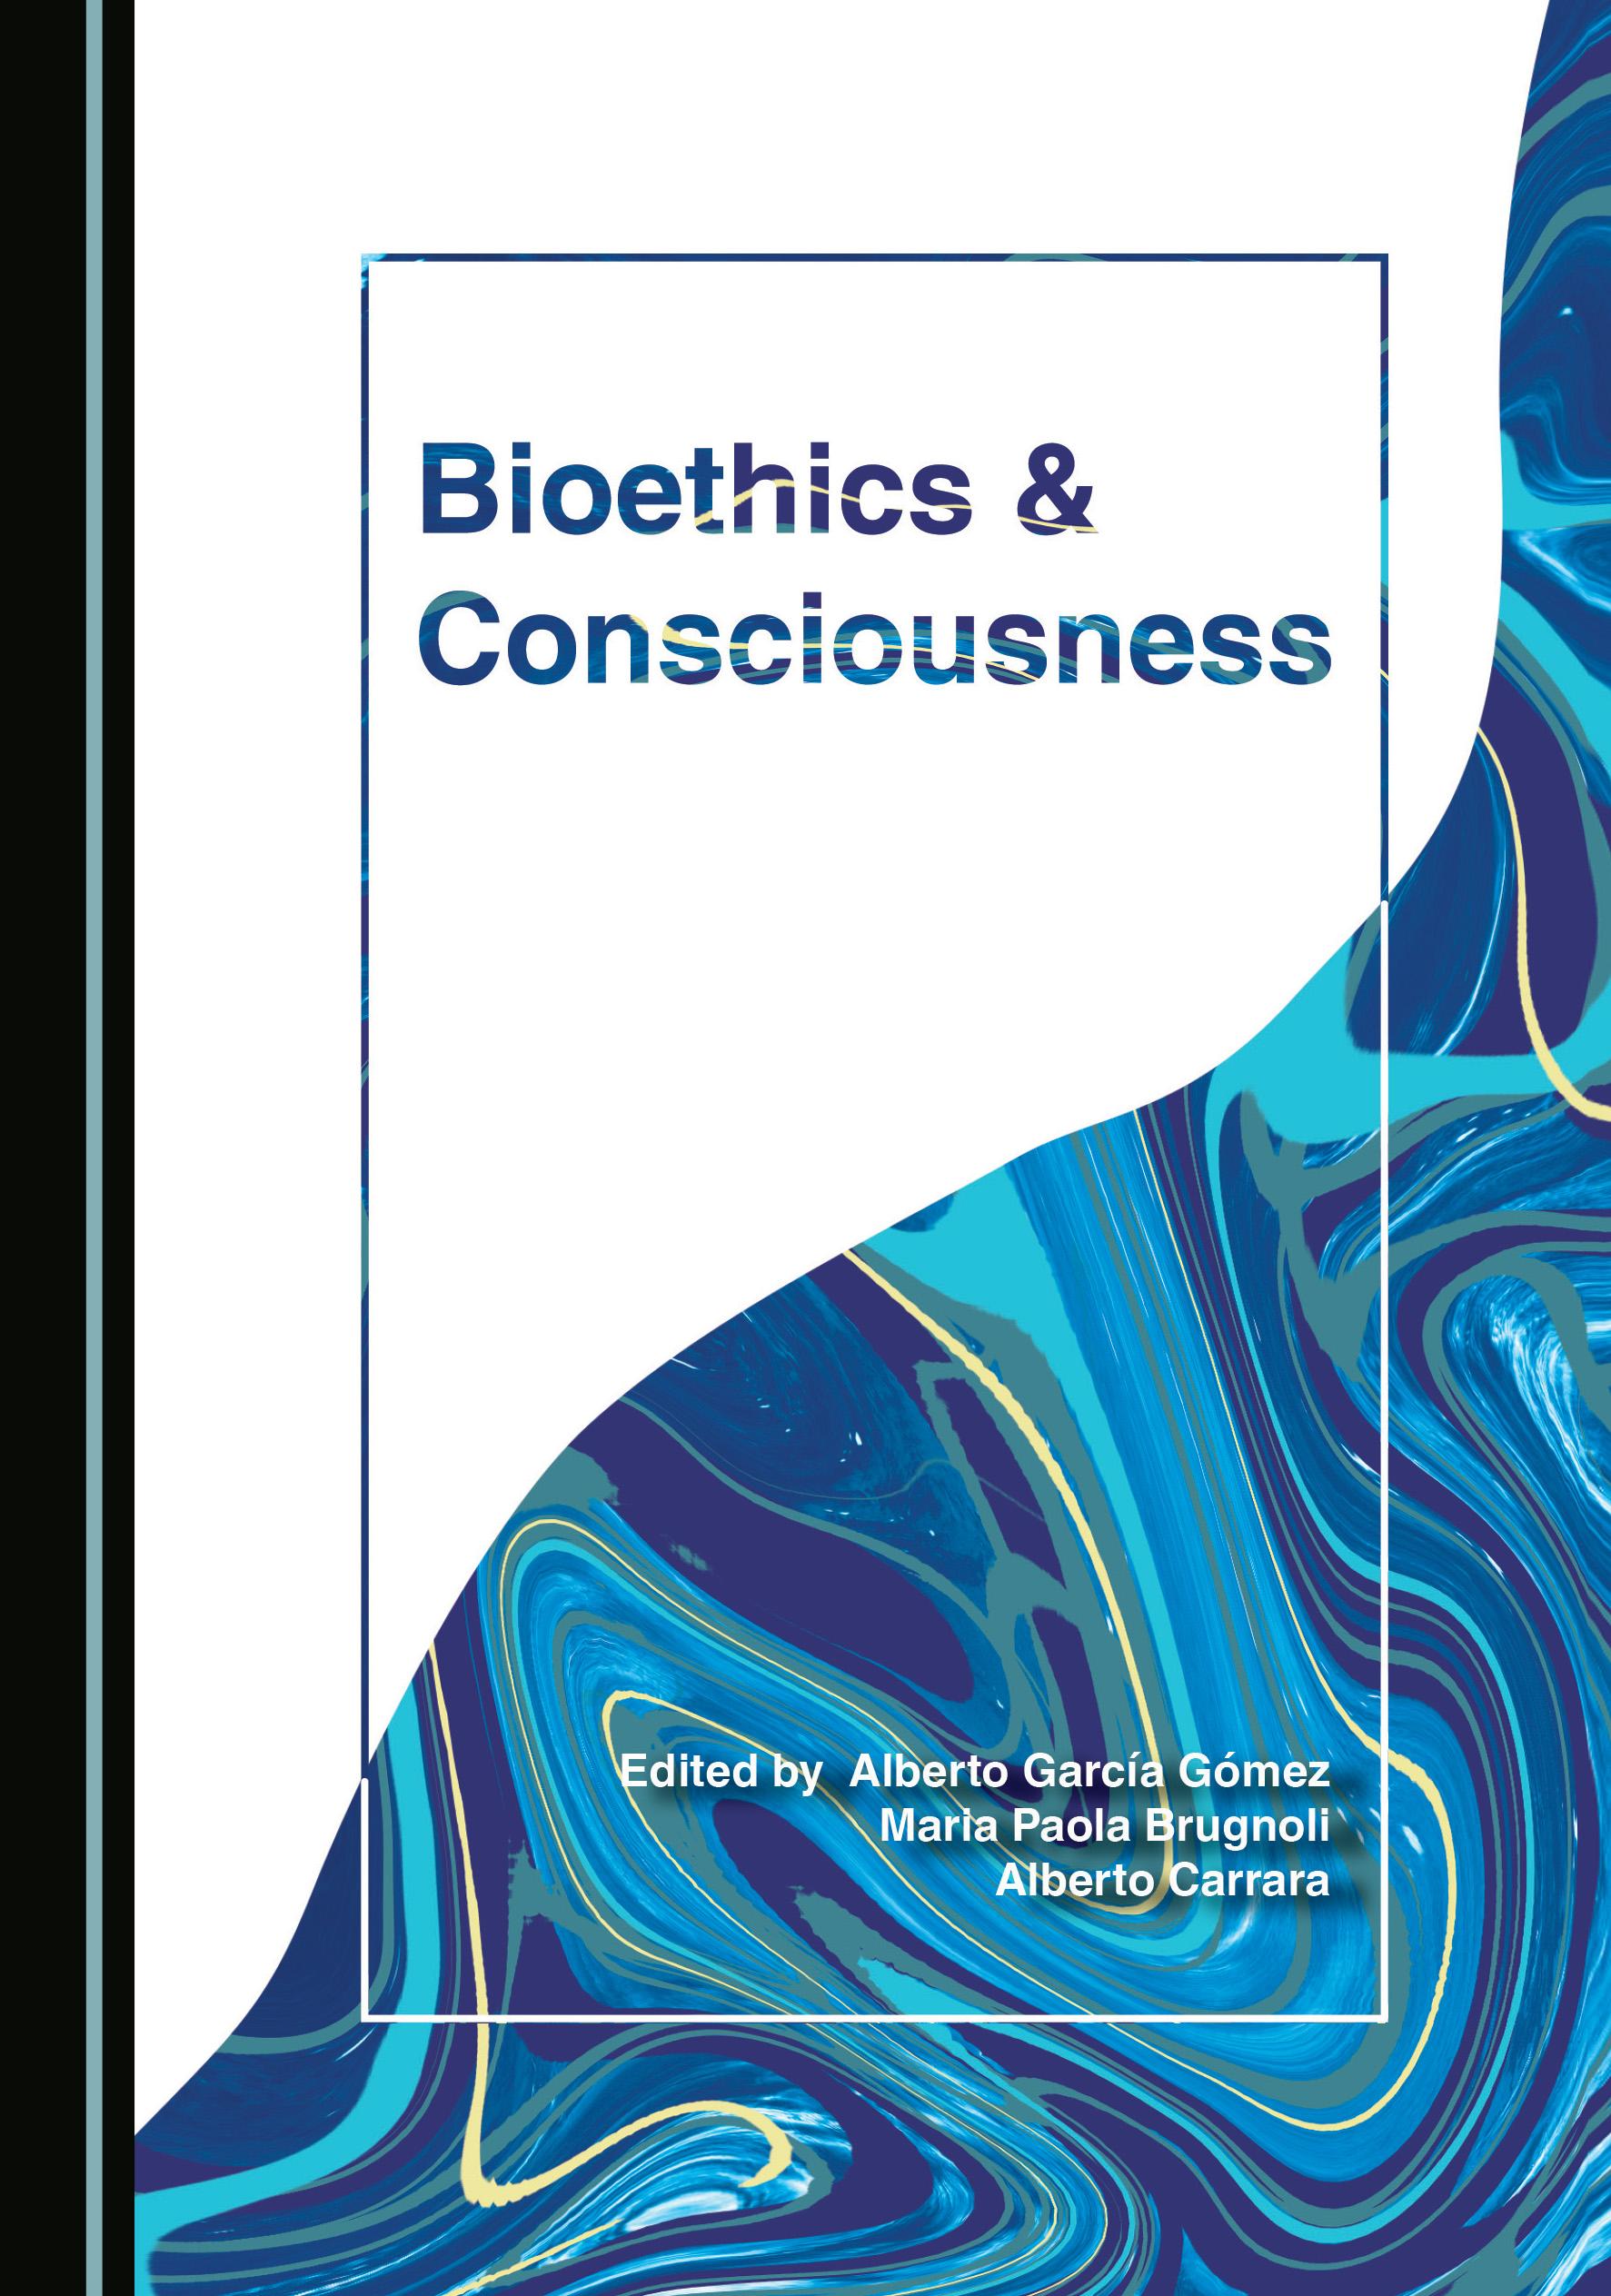 Bioethics and Consciousness